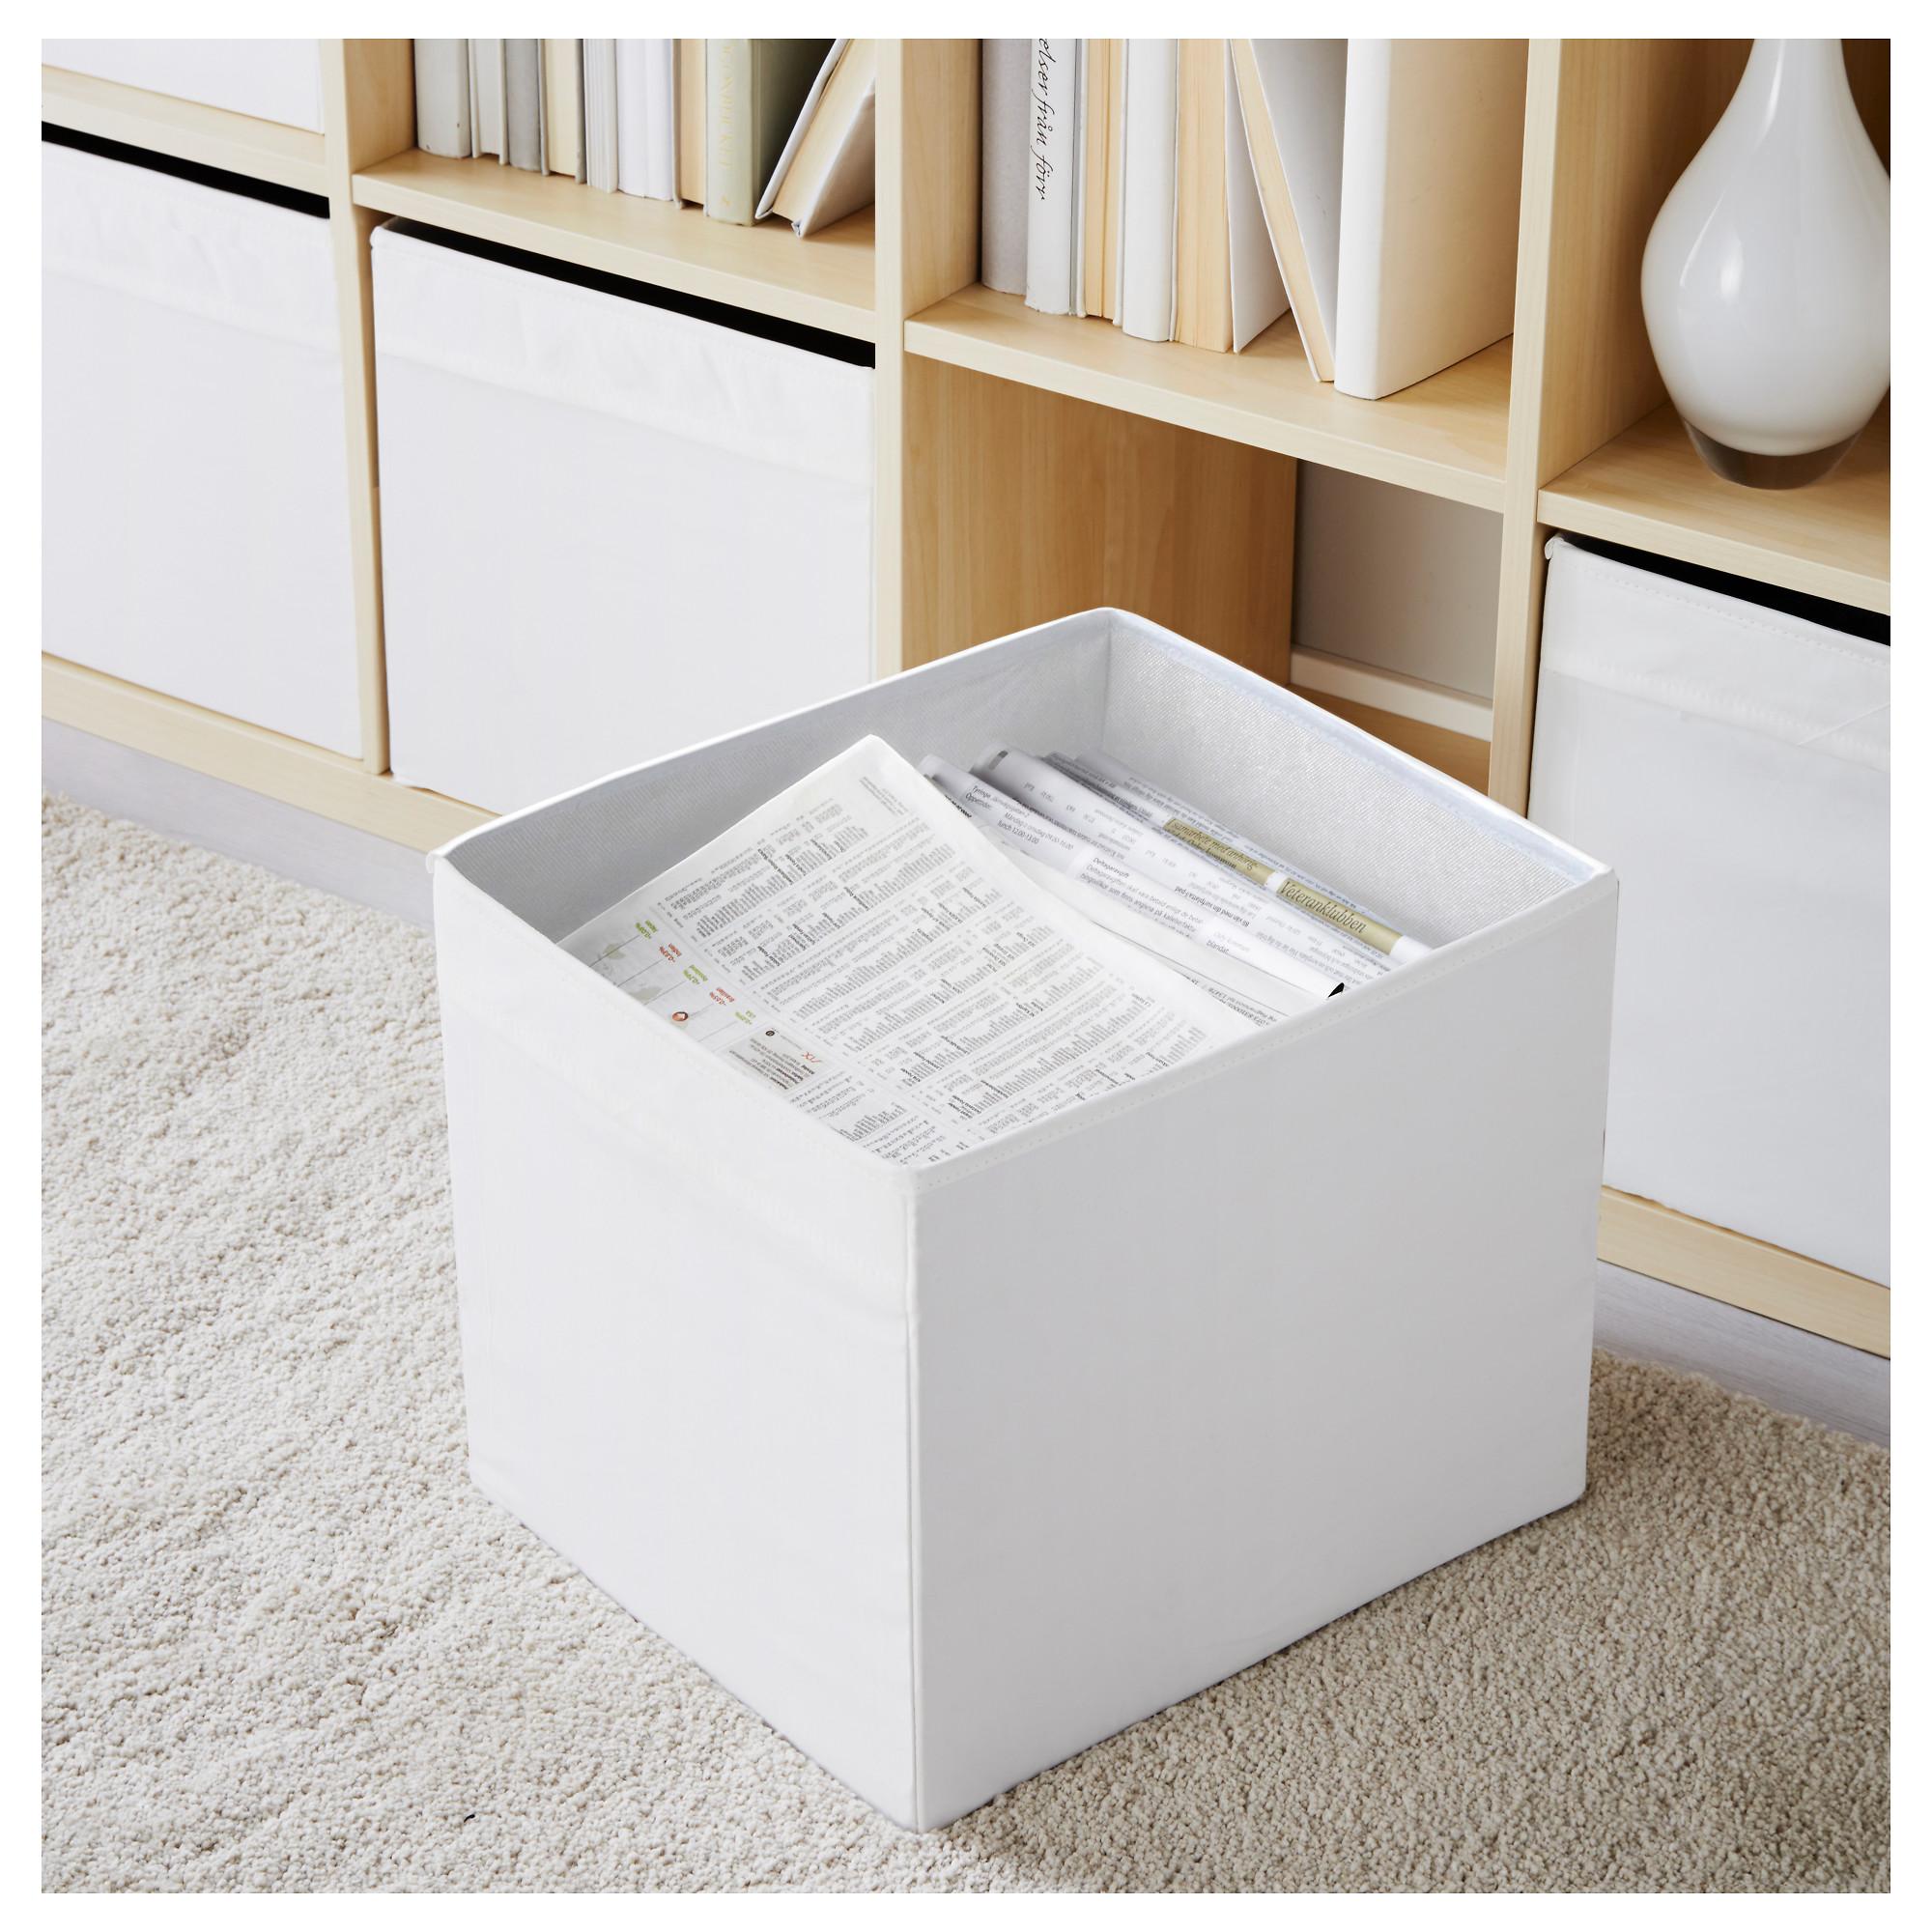 ikea dr na wei fach box expedit kallax regal aufbewahrungsbox kiste 4 st ck ebay. Black Bedroom Furniture Sets. Home Design Ideas